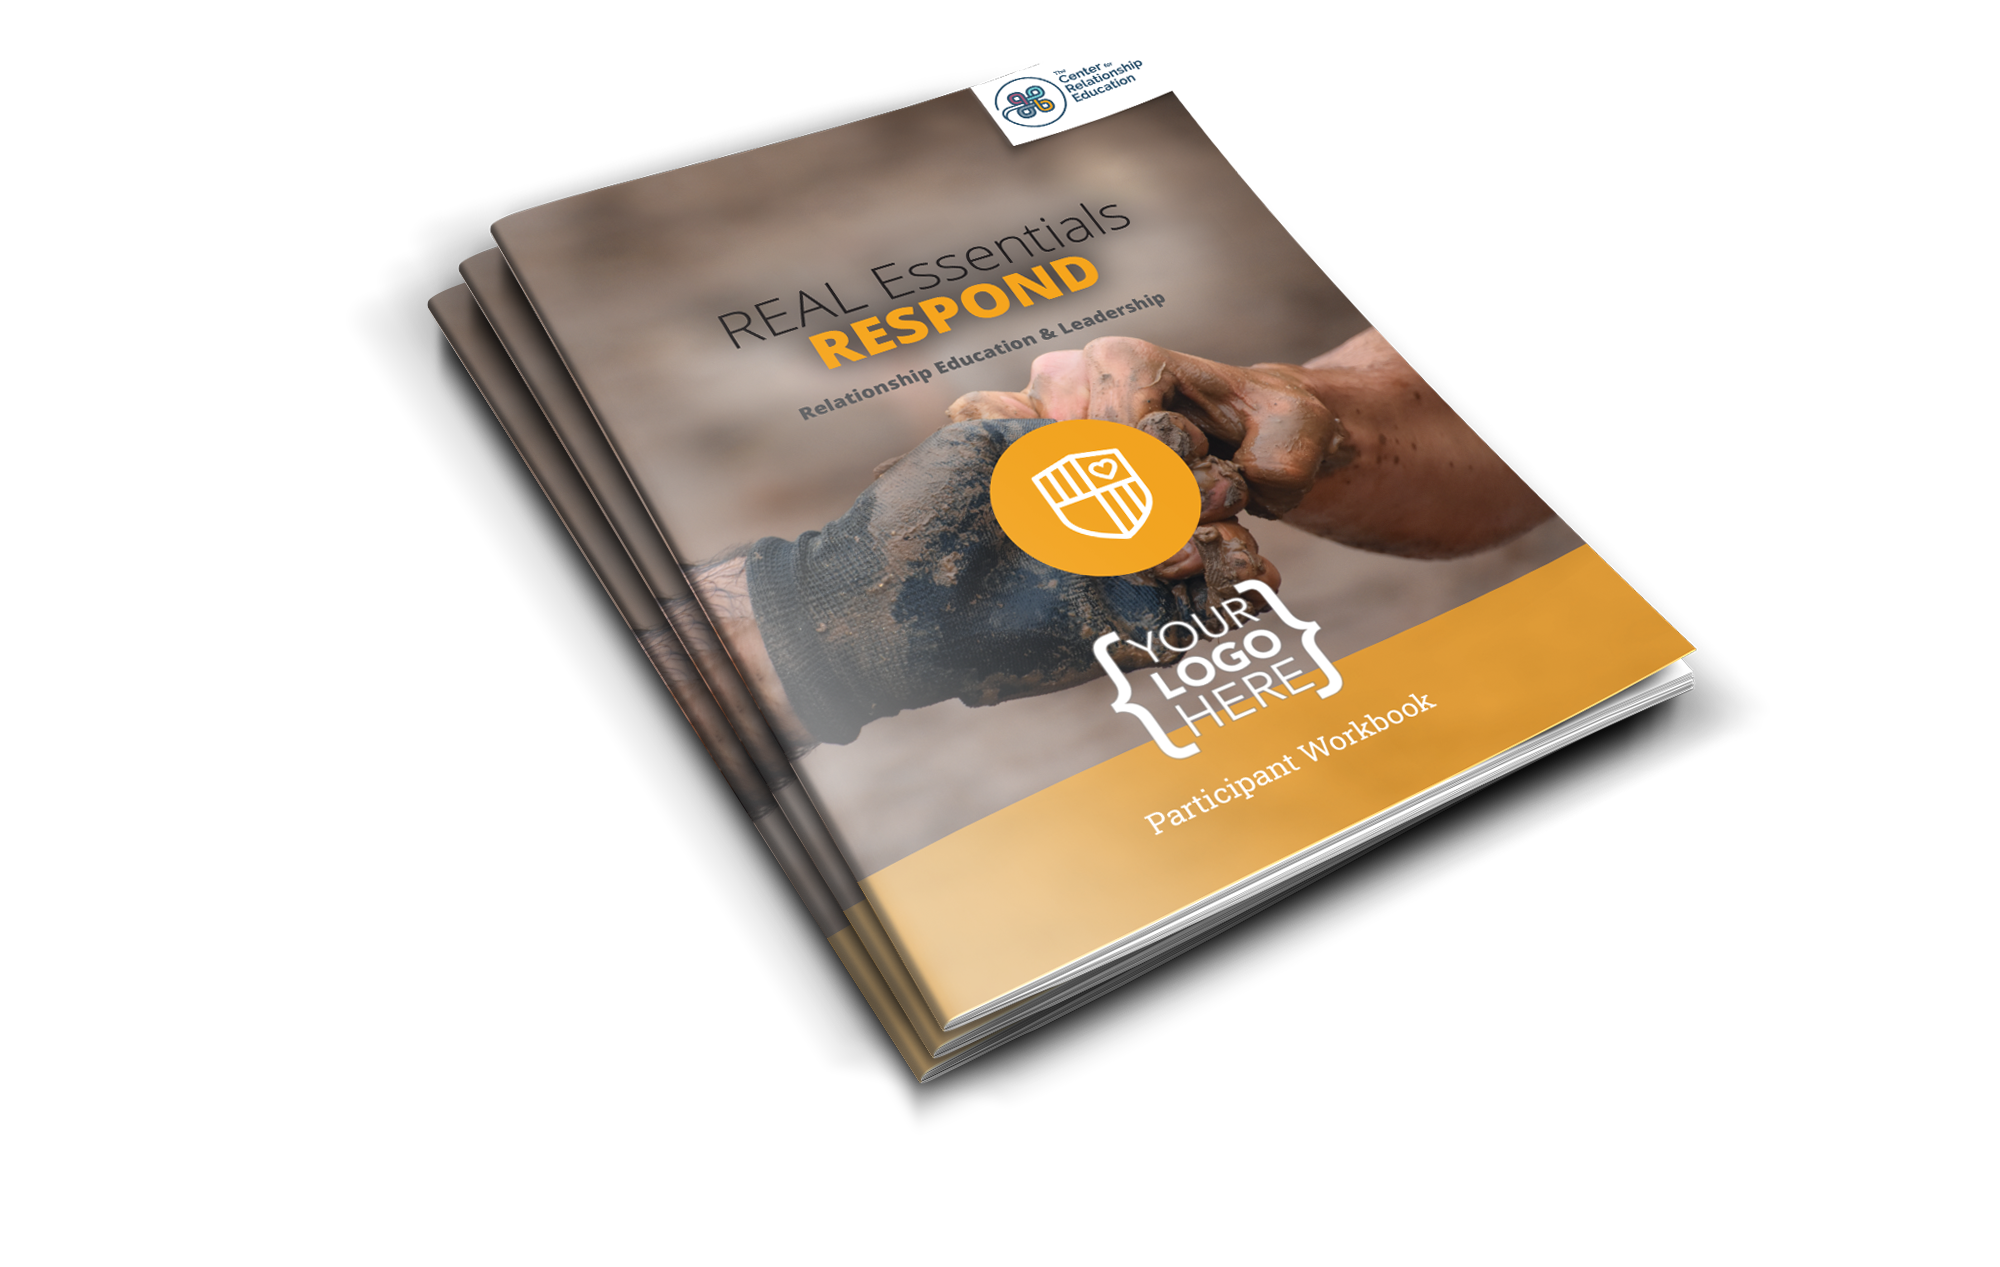 REAL Essentials Respond Custom Workbook Licensing Agreement